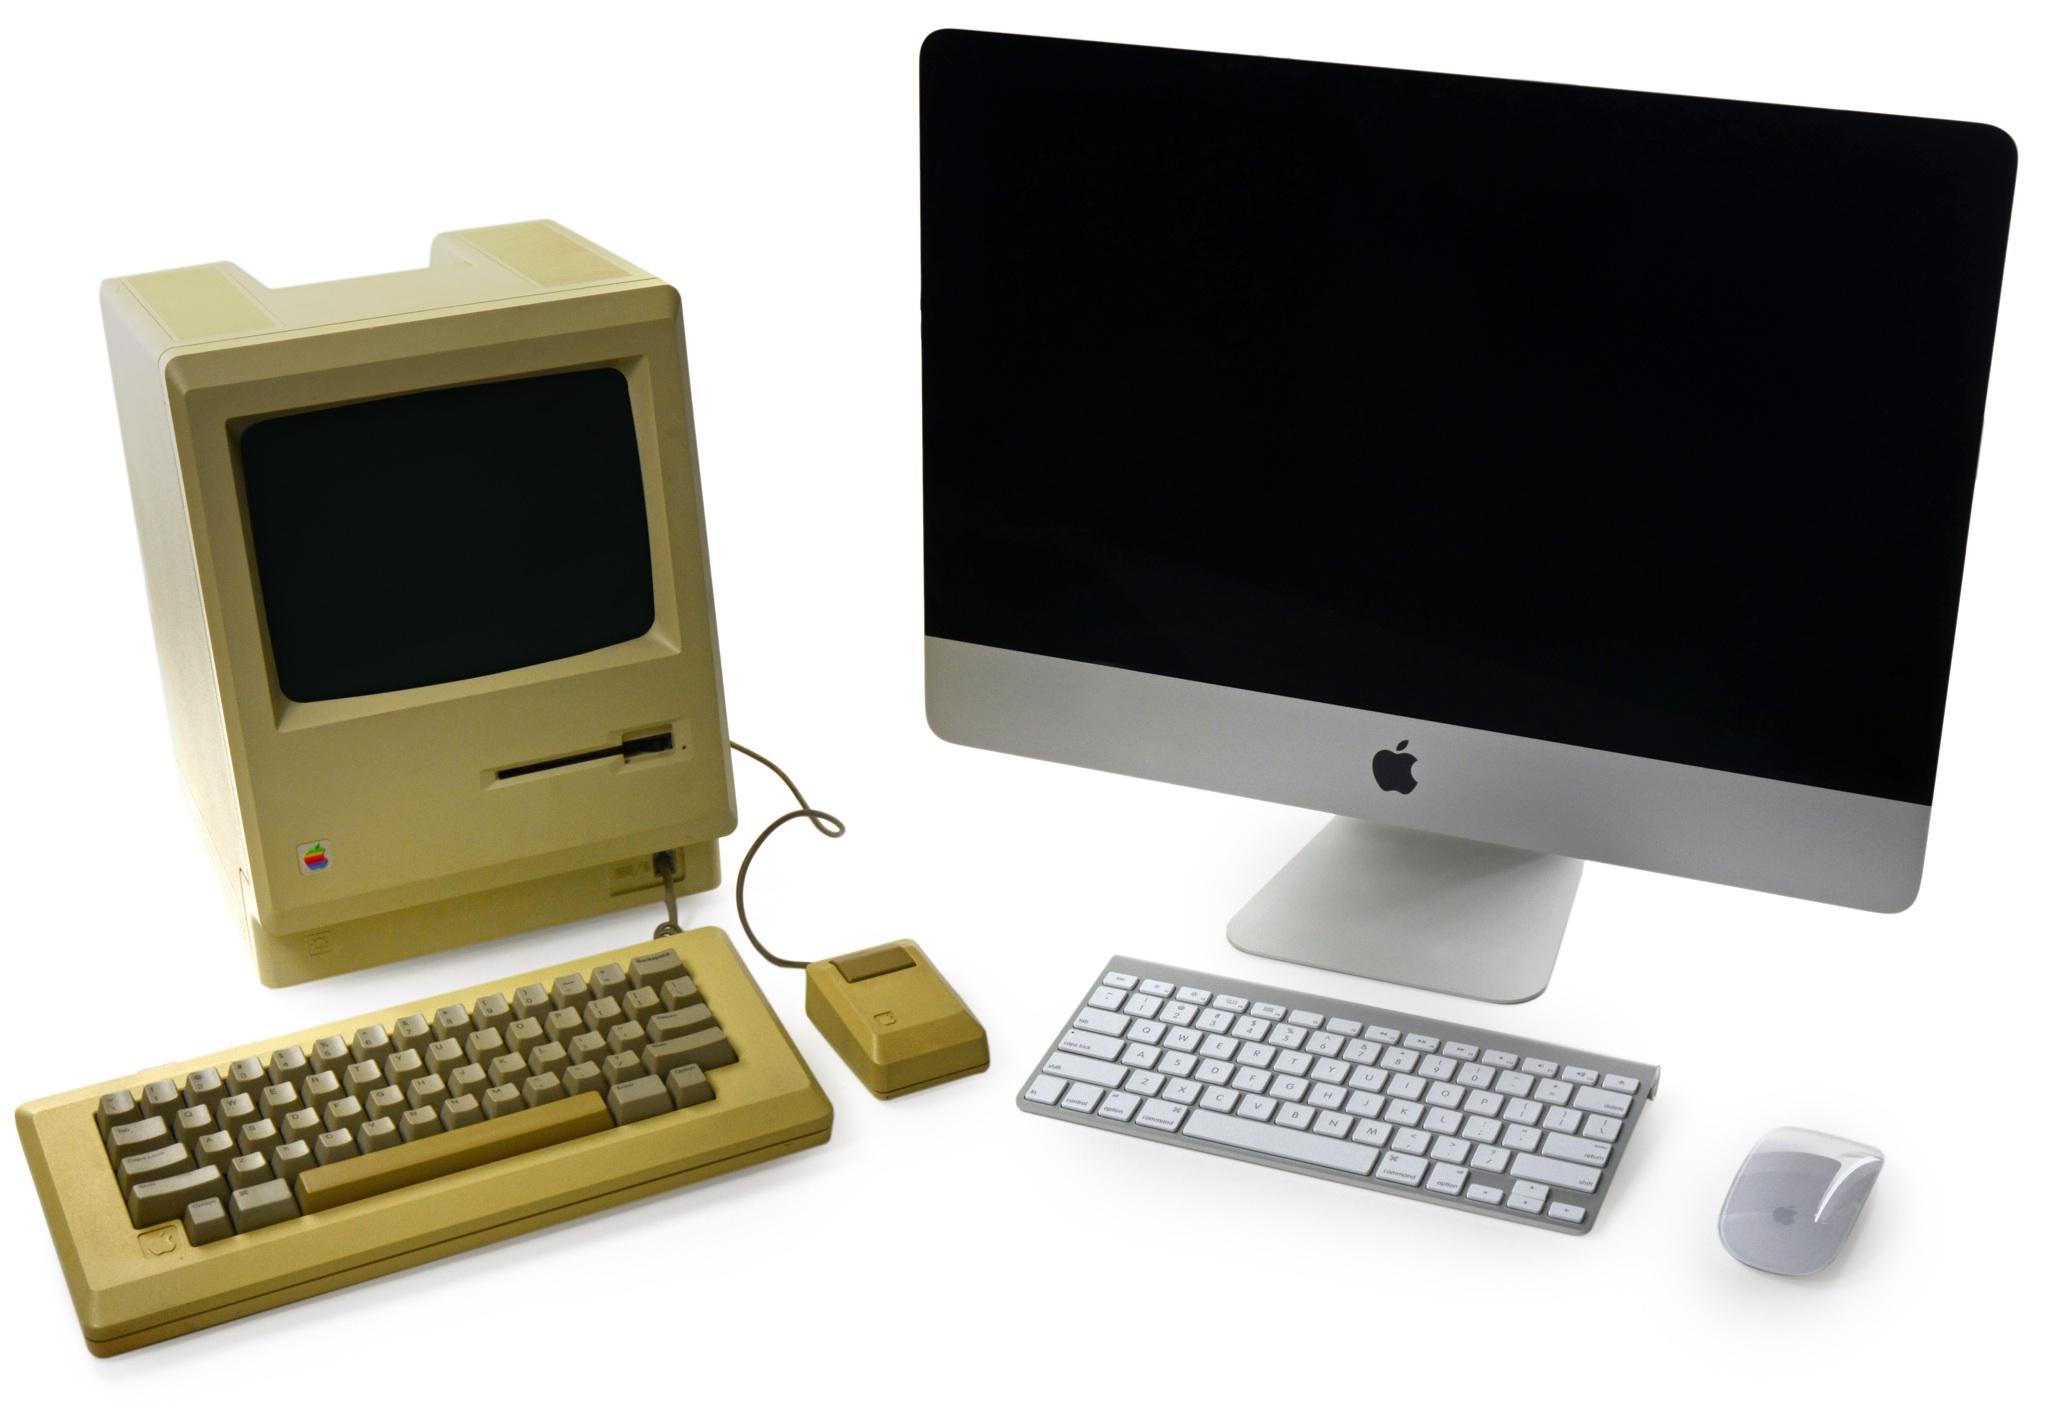 Original Mac teardown (iFixit 005)